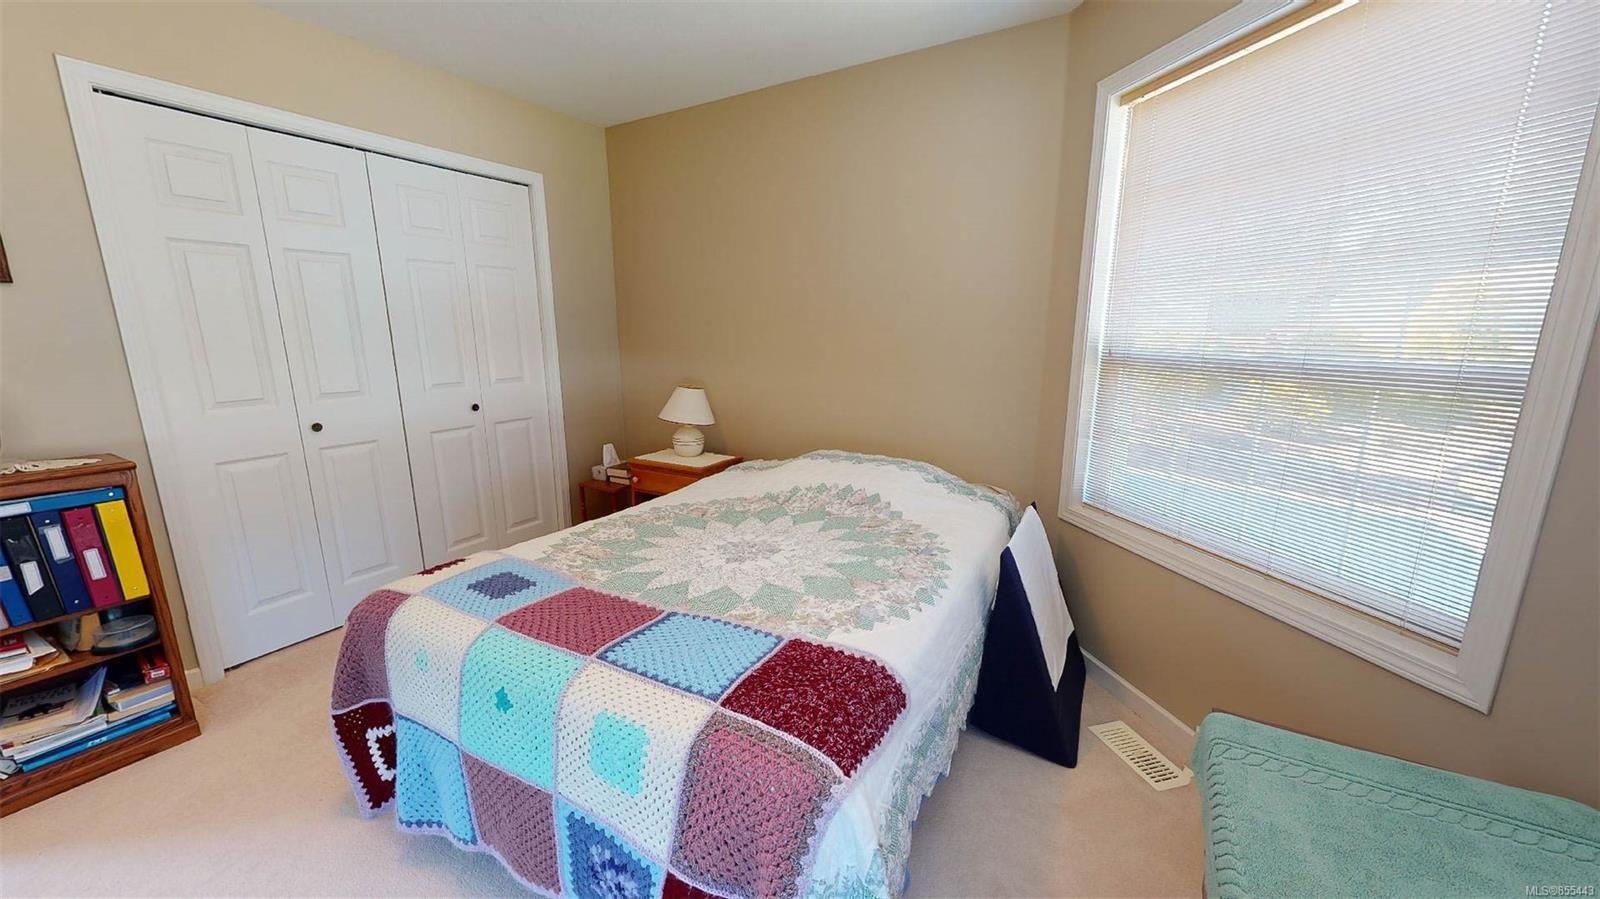 Photo 7: Photos: 1294 Leeward Way in : PQ Qualicum Beach House for sale (Parksville/Qualicum)  : MLS®# 855443